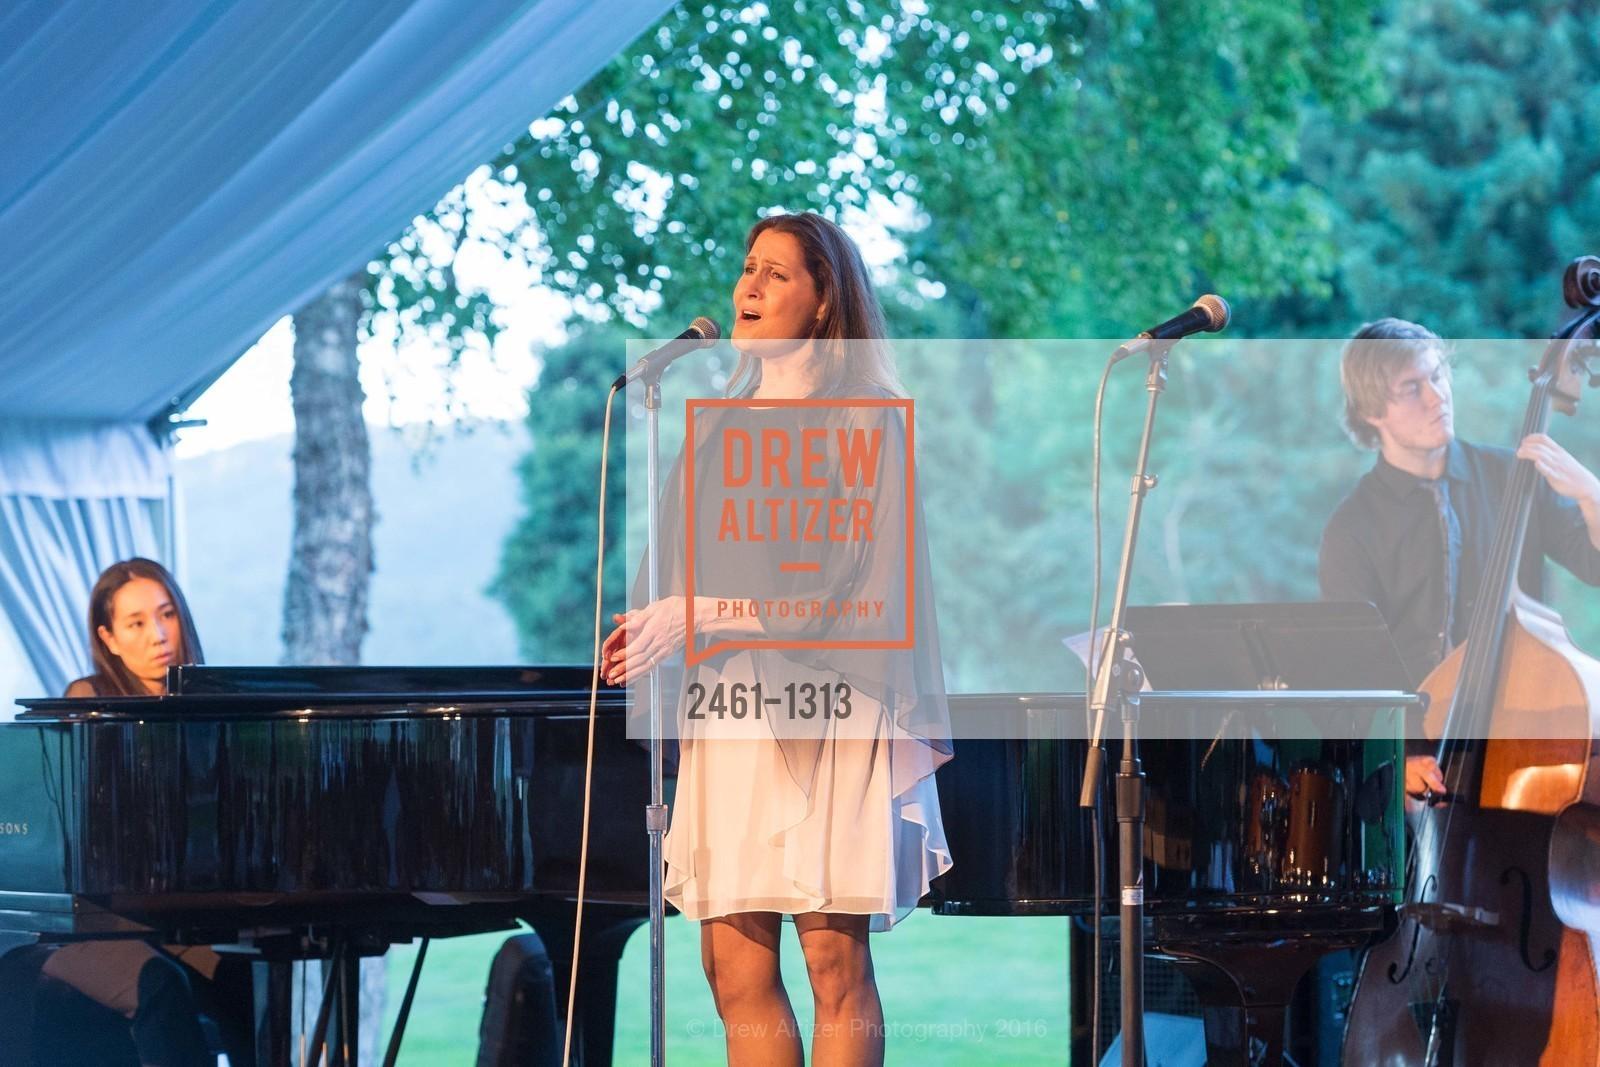 Monica Mancini, Photo #2461-1313